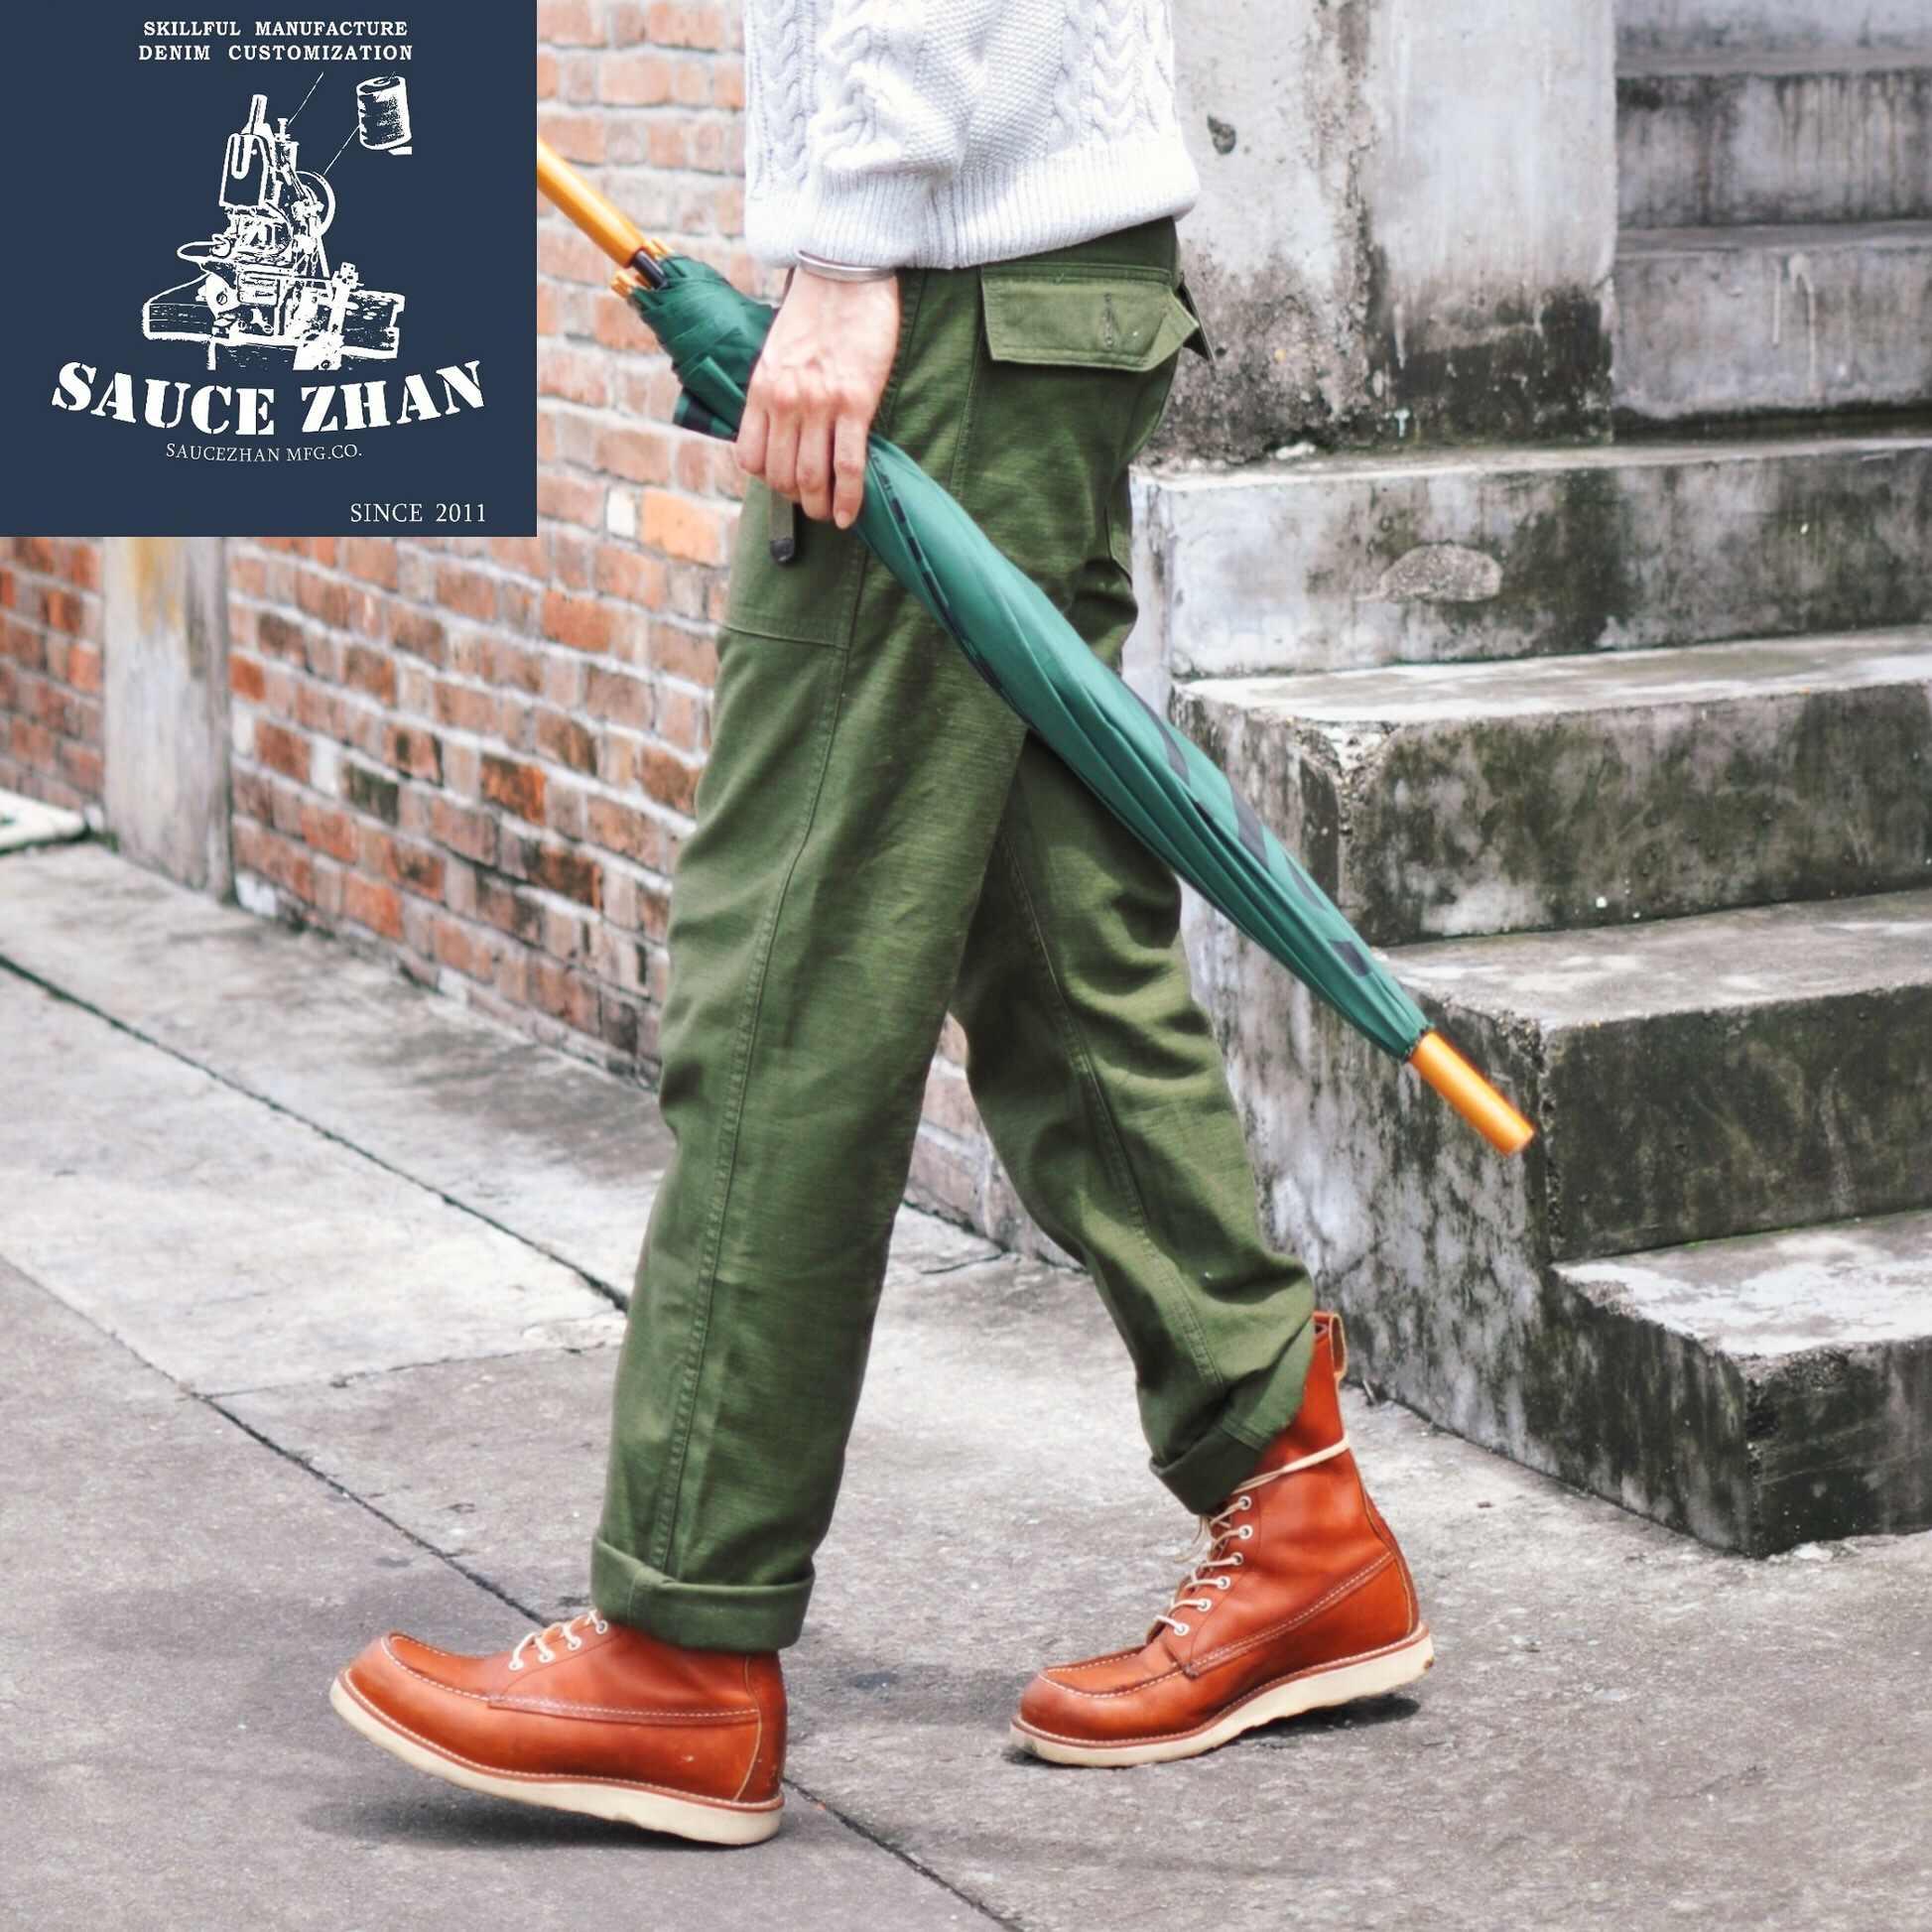 SauceZhan OG107 Utility Müdigkeit Hosen Military Hosen VINTAGE Klassische Olive Satin Gerade Männer Hosen Hosen & Capris Casual Hosen